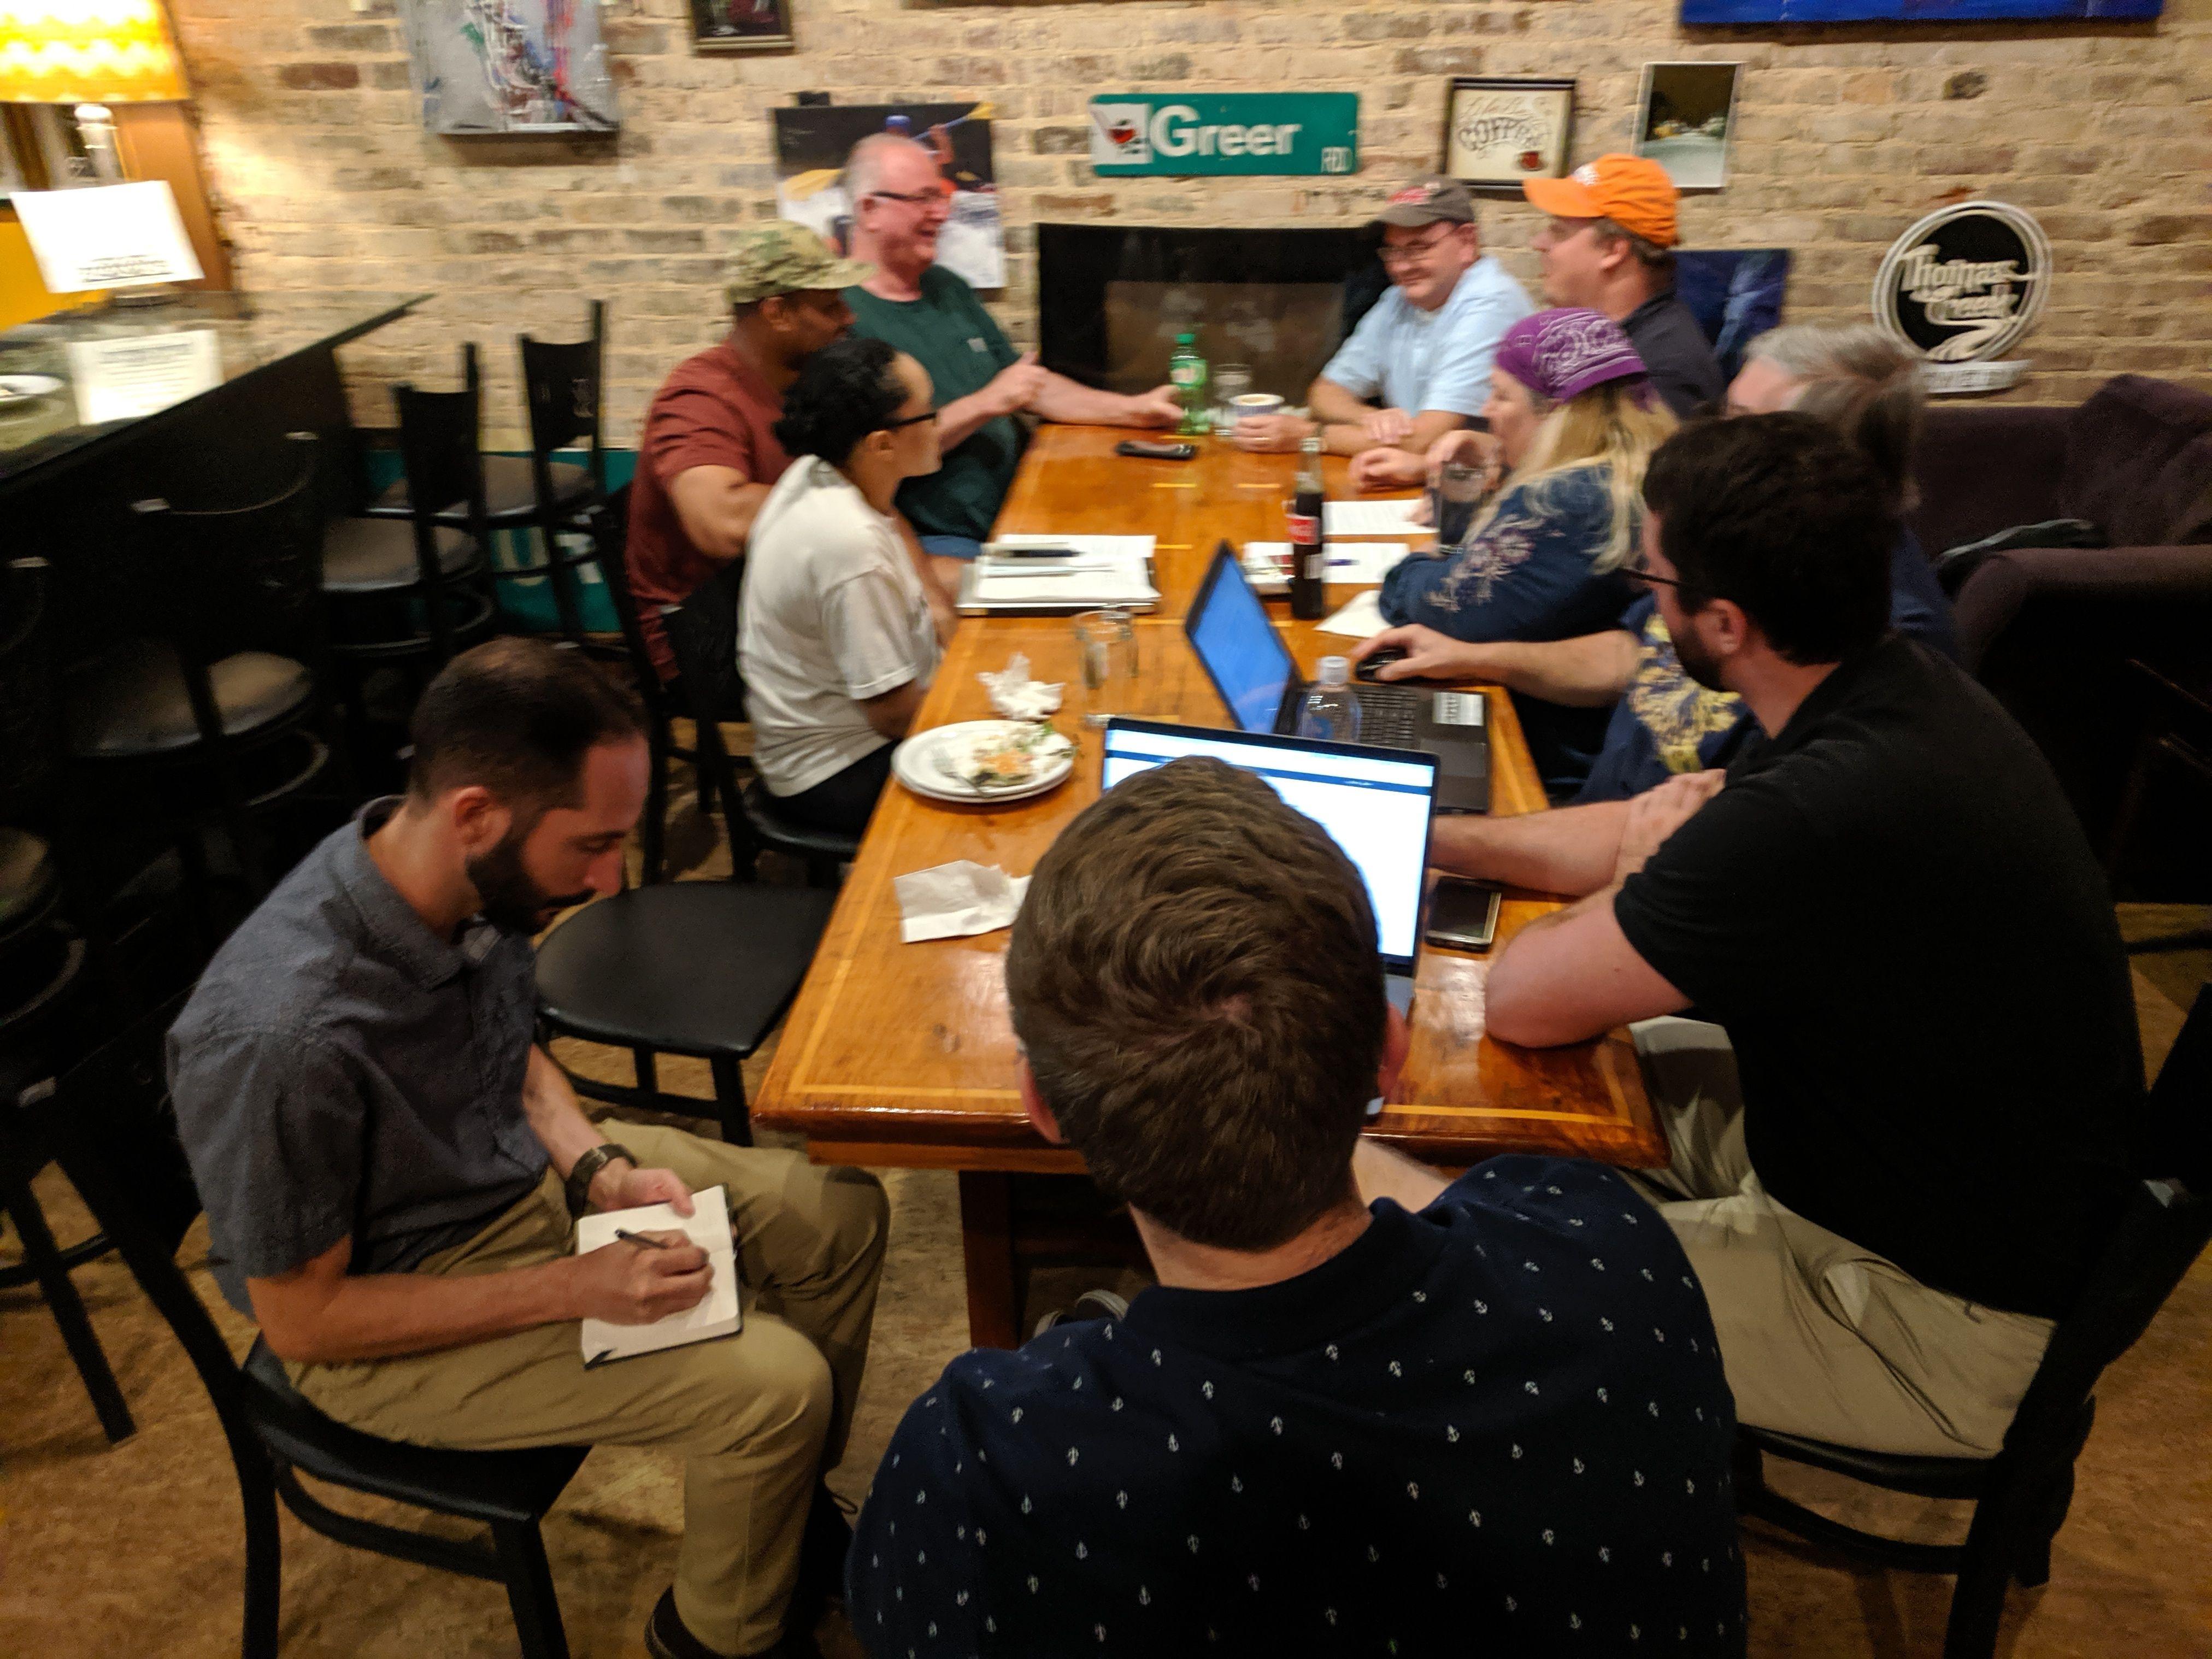 Greer Programmers Group